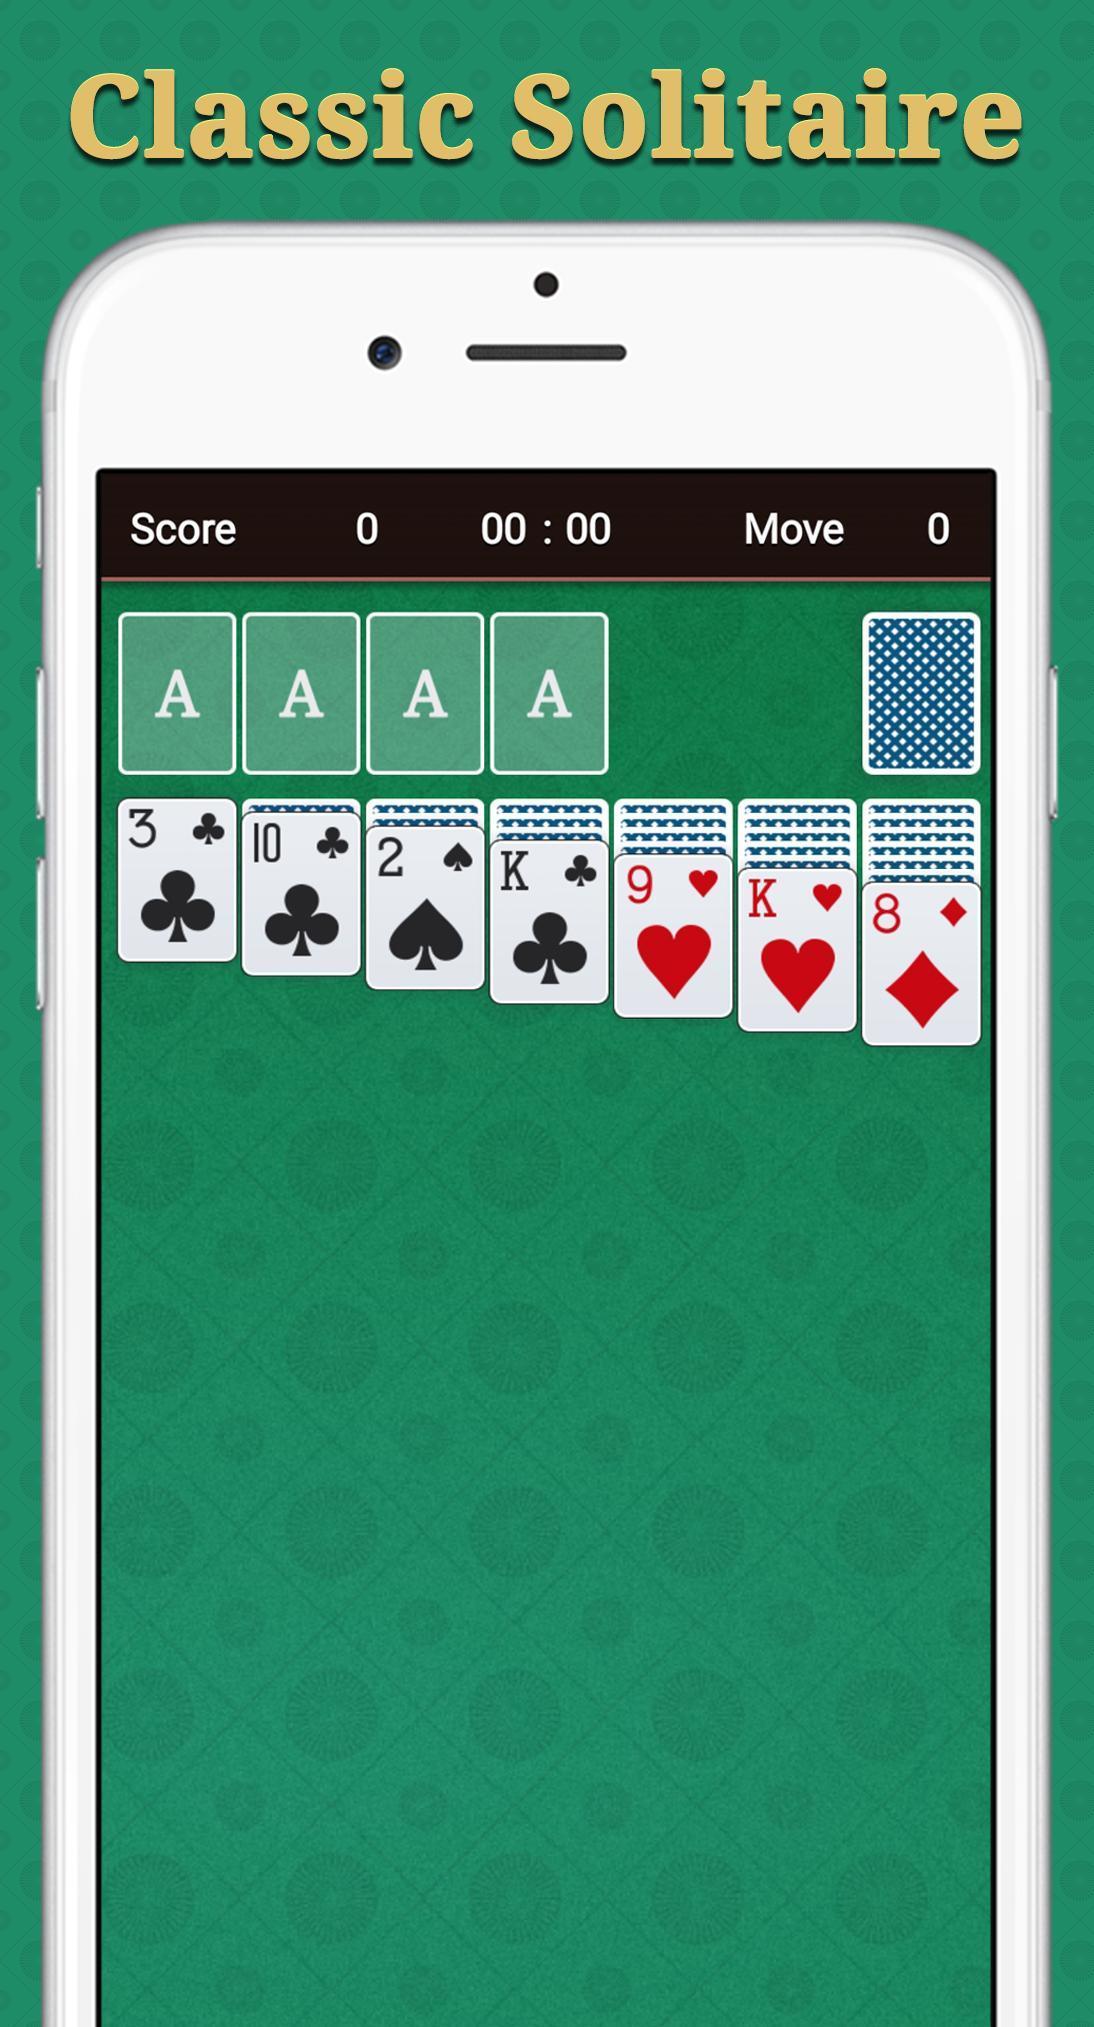 Solitaire 1.71 Screenshot 15